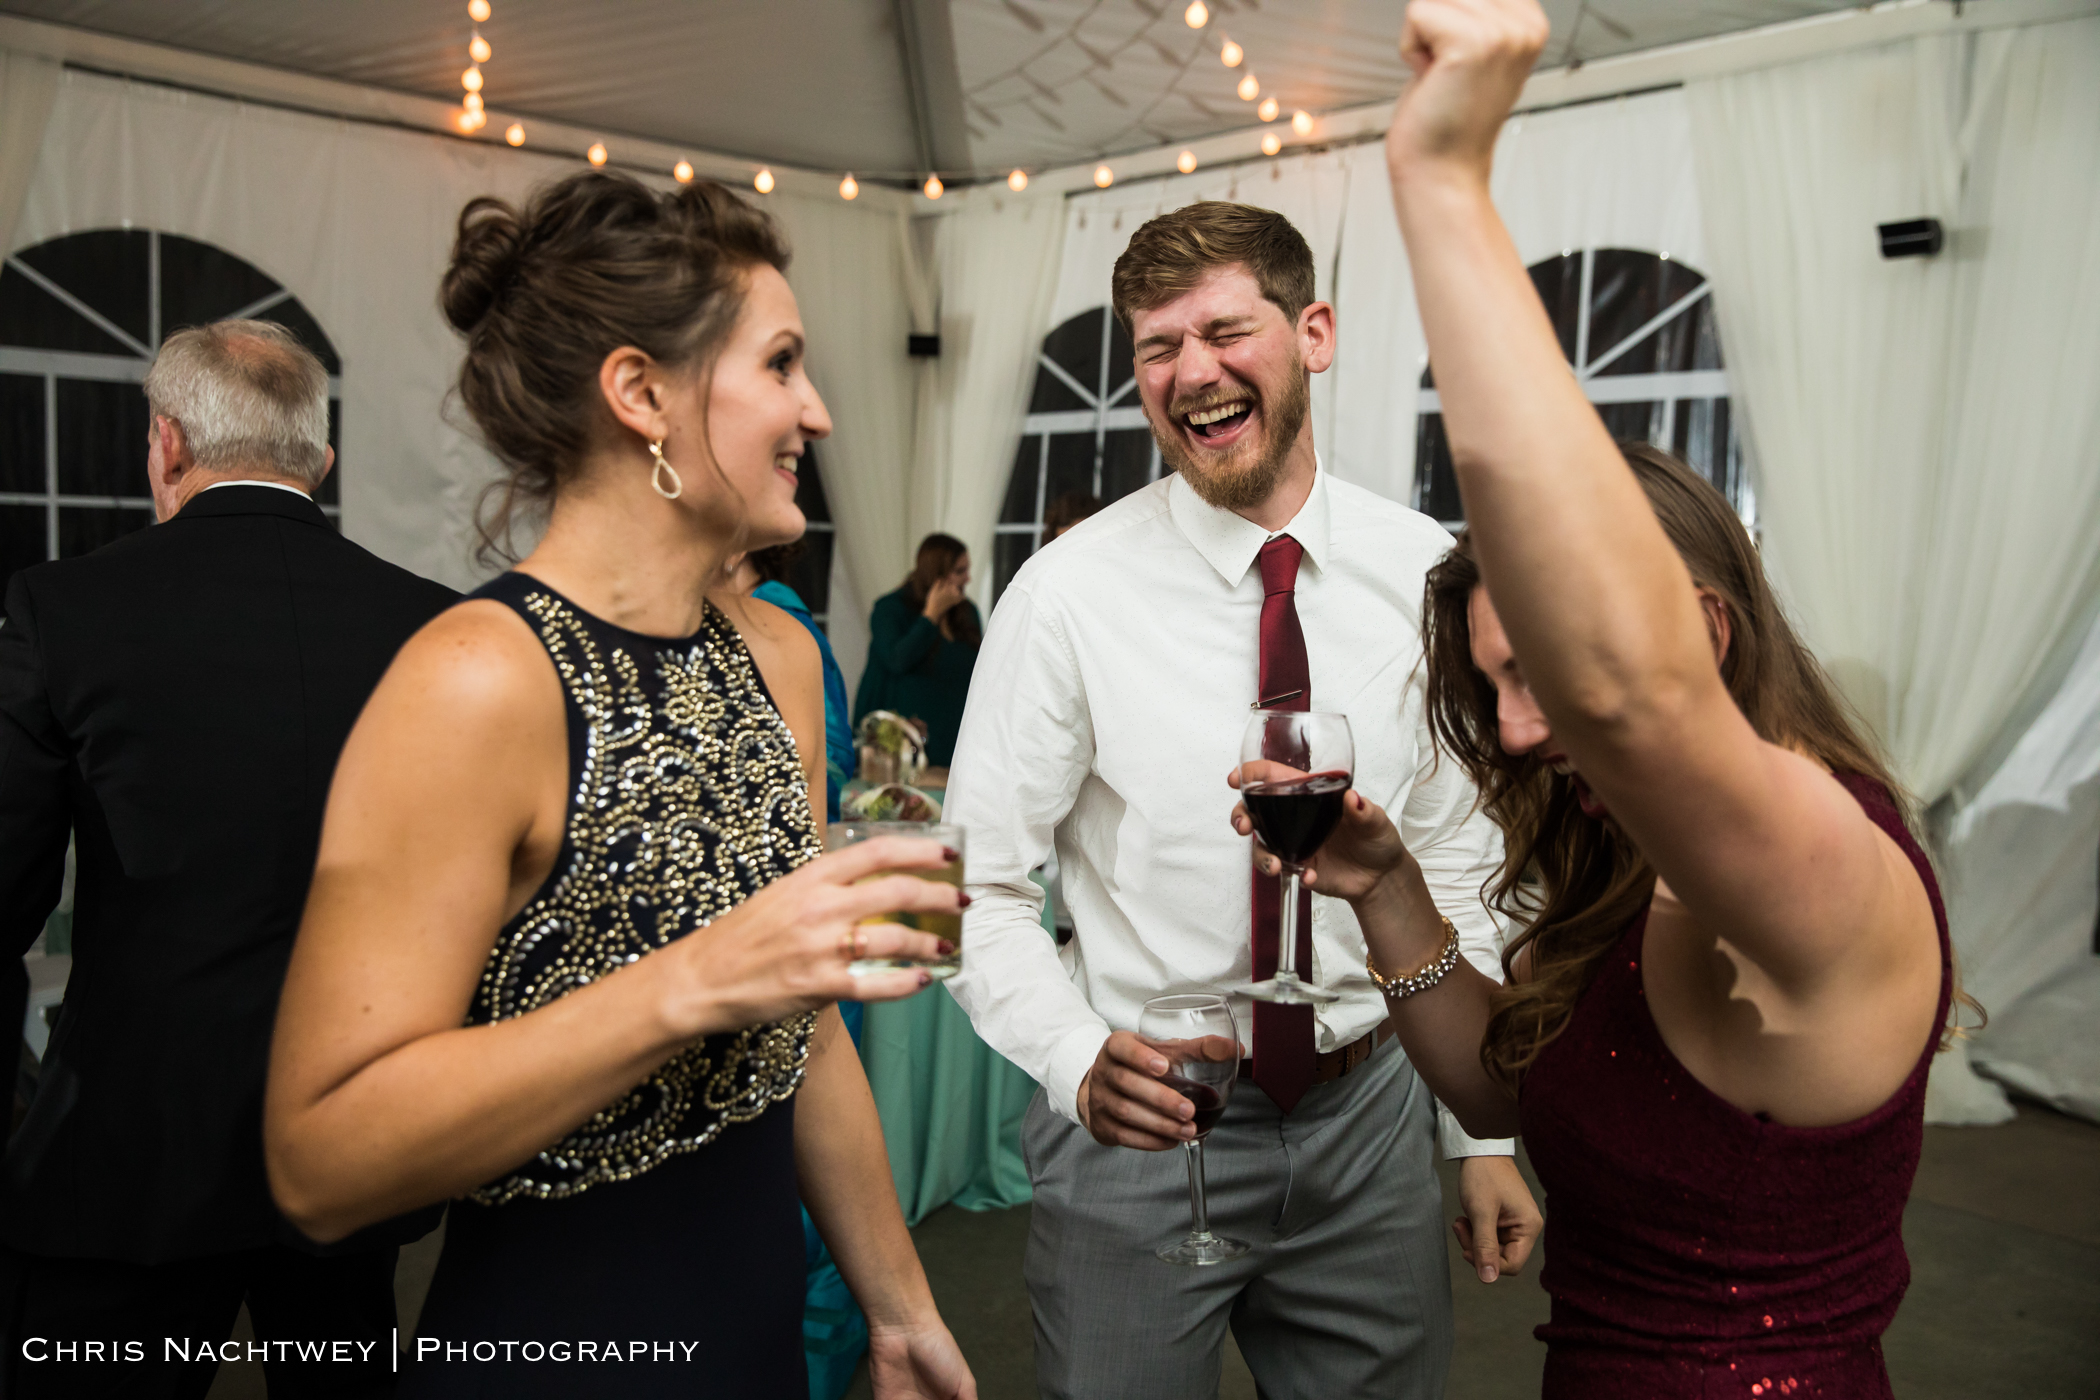 harkness-wedding-photos-chris-nachtwey-photography-2018-41.jpg